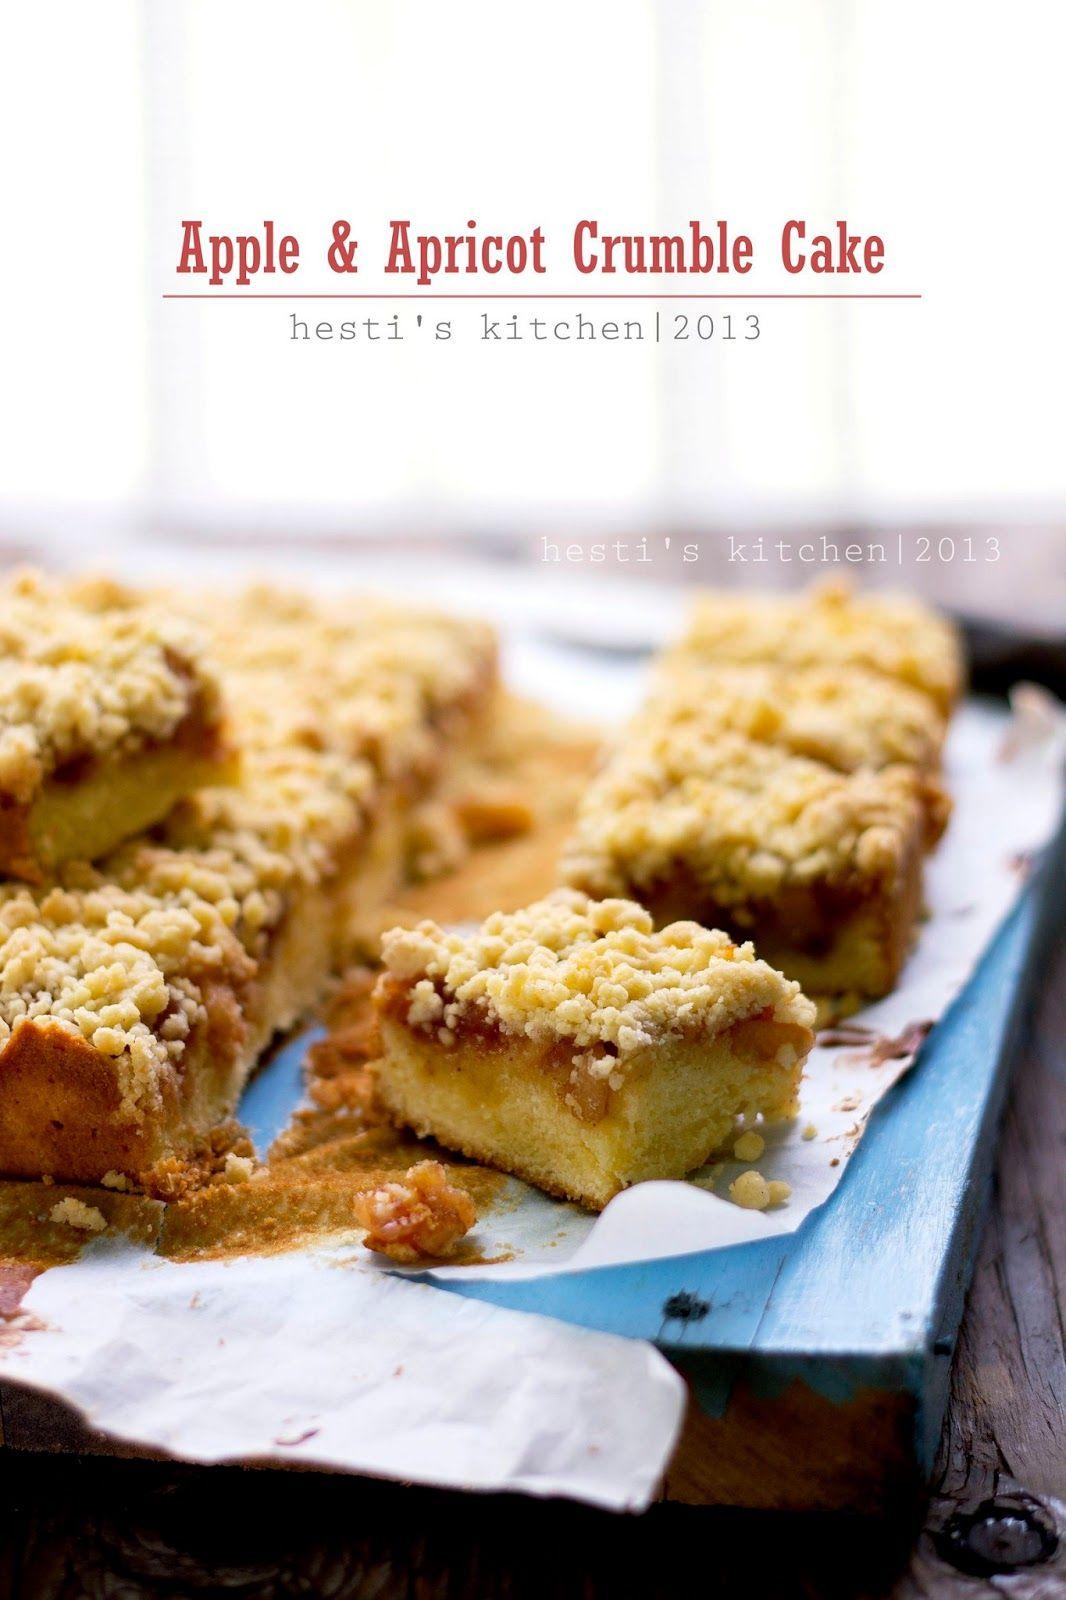 HESTI'S KITCHEN yummy for your tummy Apple & Apricot